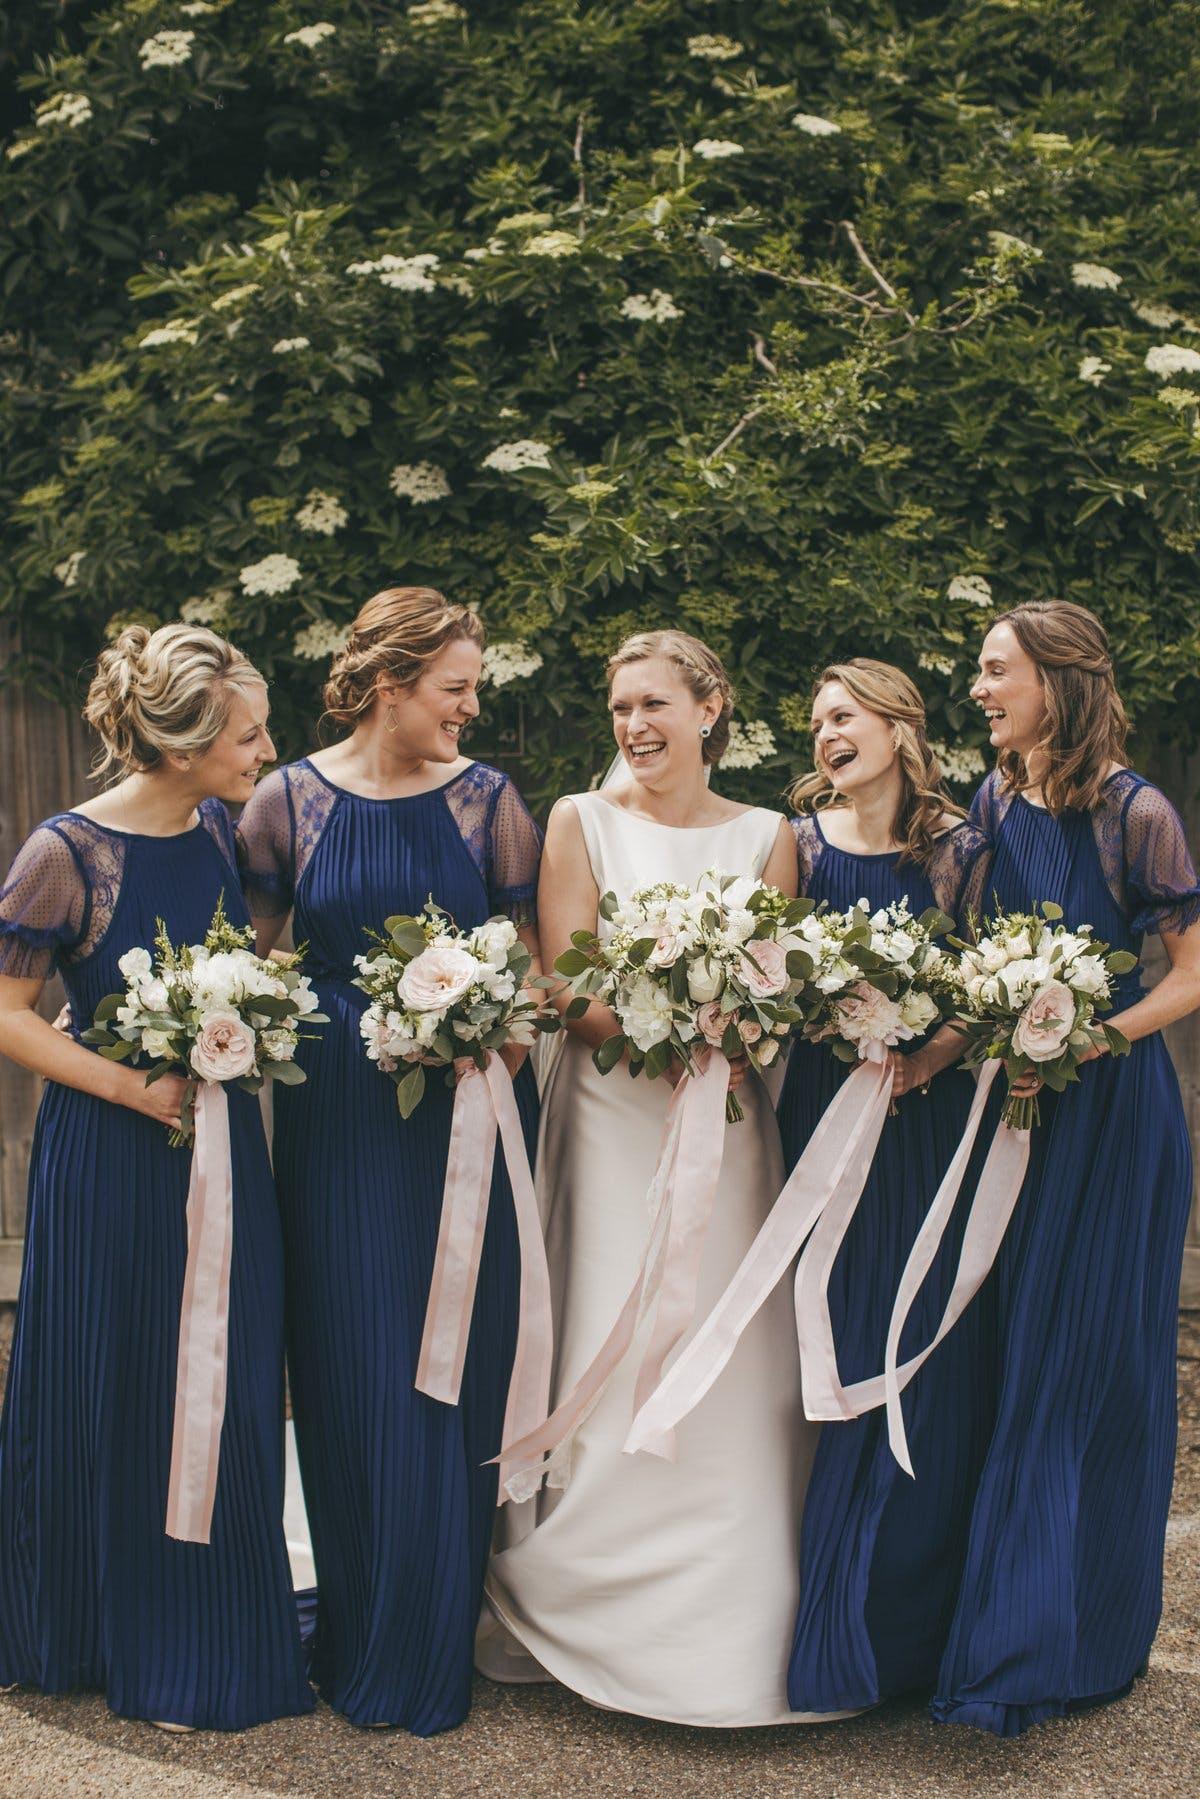 Ellie and bridesmaids